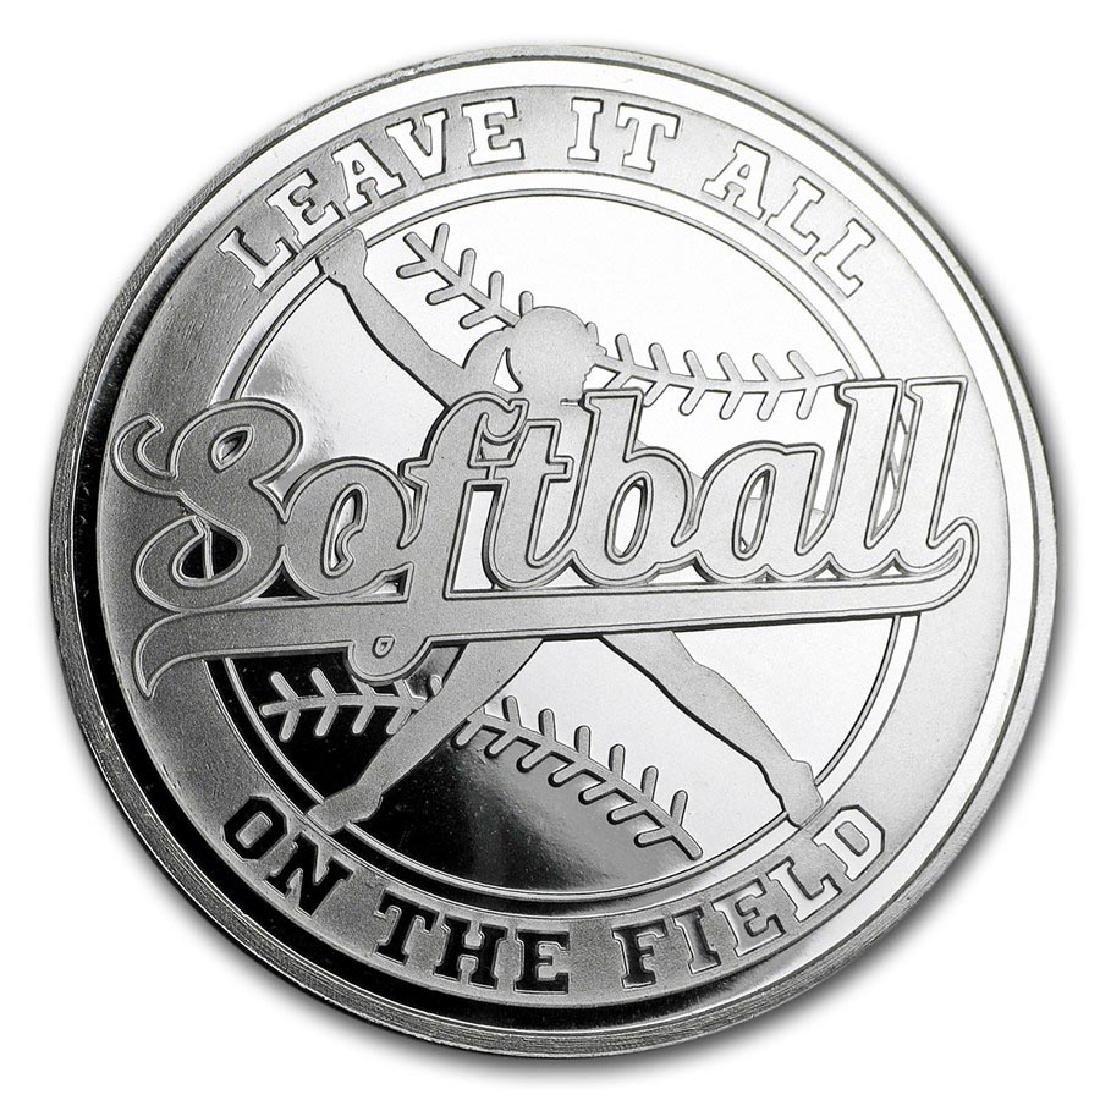 1 oz Silver Round - Softball